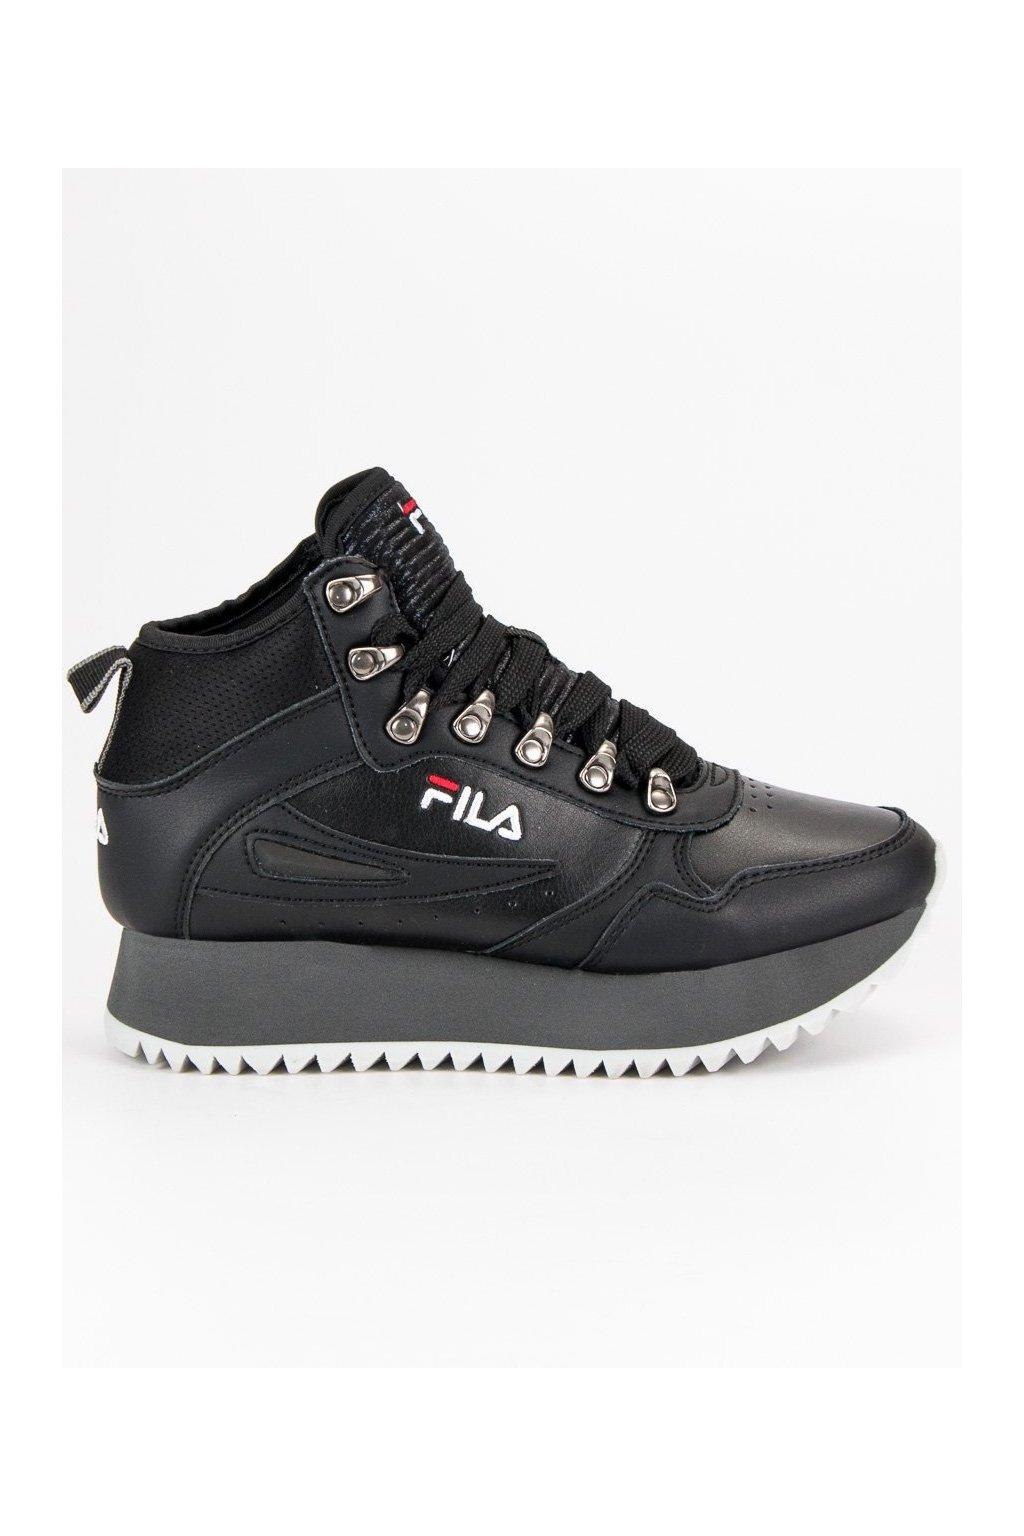 Dámske kožené topánky FILA ORBIT ZEPPA RIPPLE čierna d4bd0d60b8e